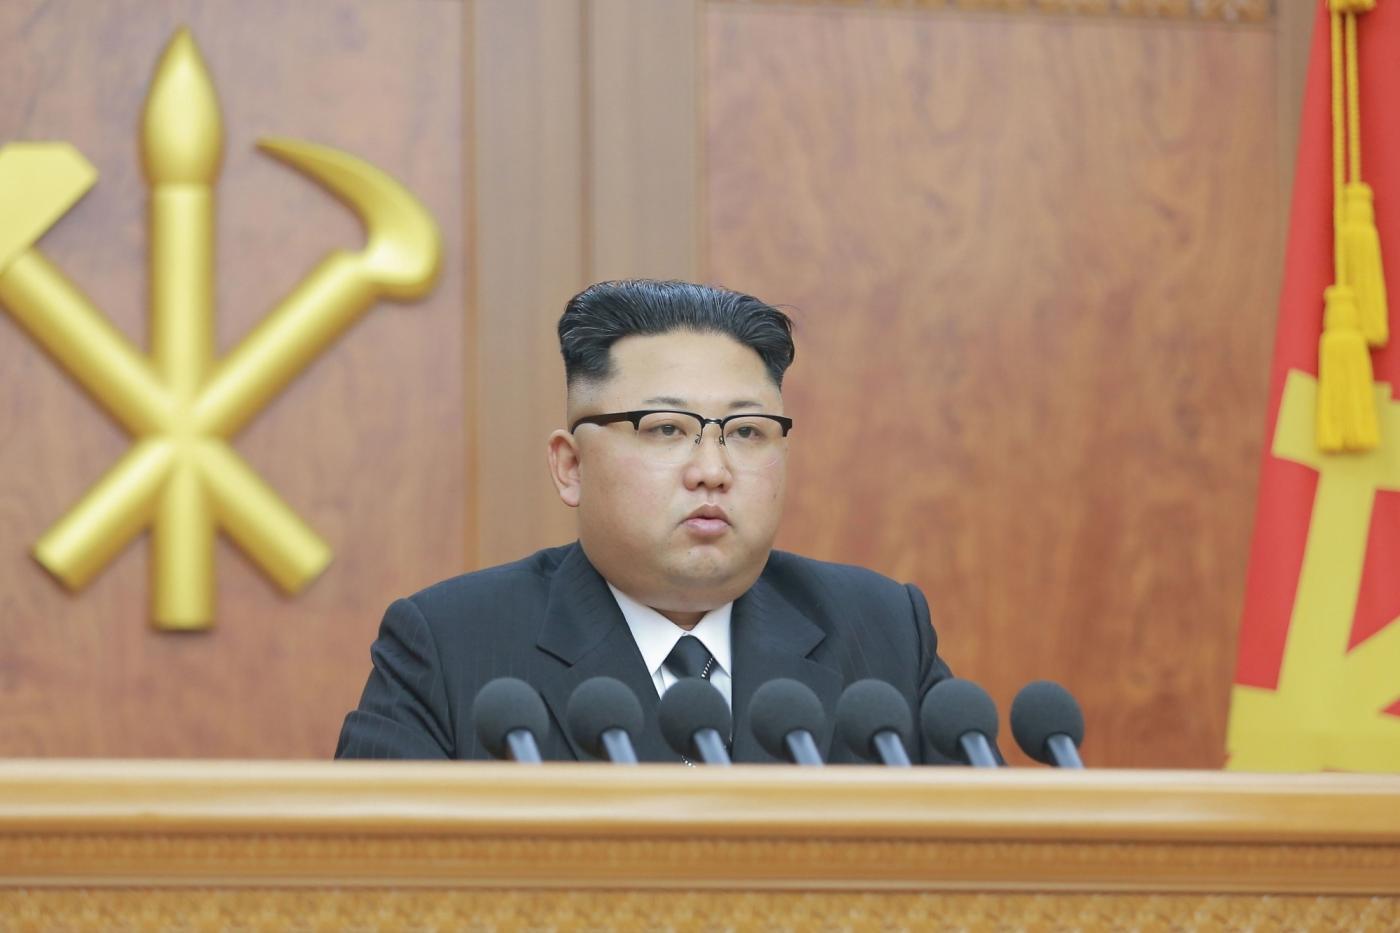 Korea North Supreme leader Kim Jong-un. (File Photo: IANS) by .